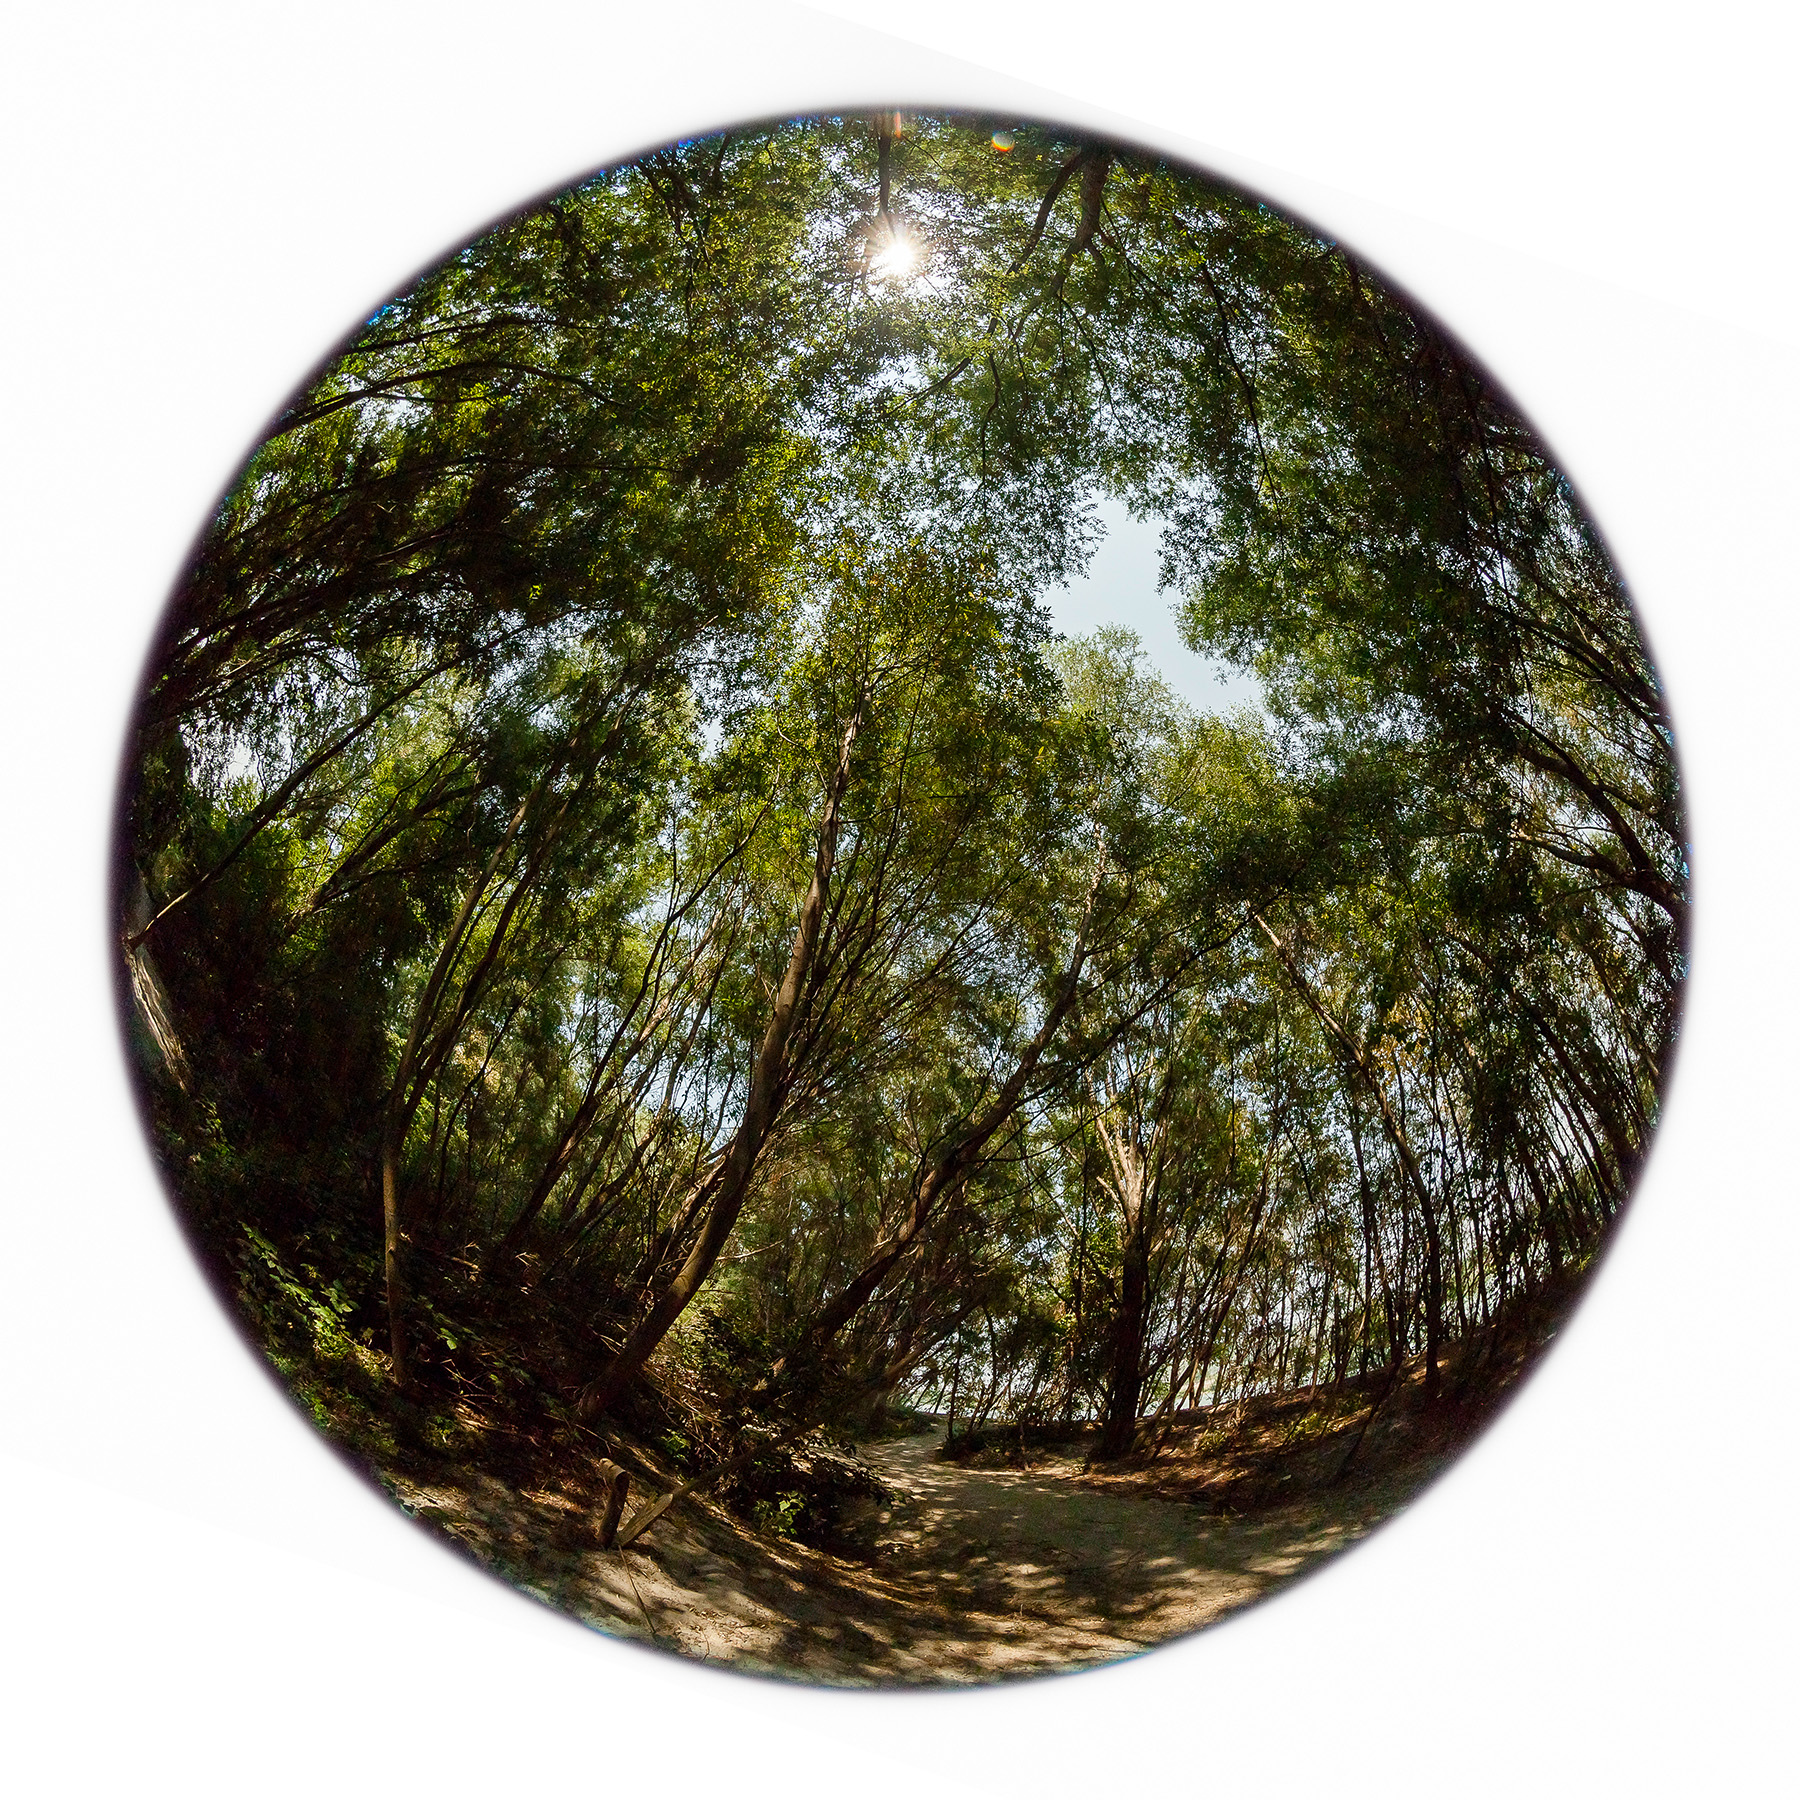 Heliocentric_VideoFrame.jpg